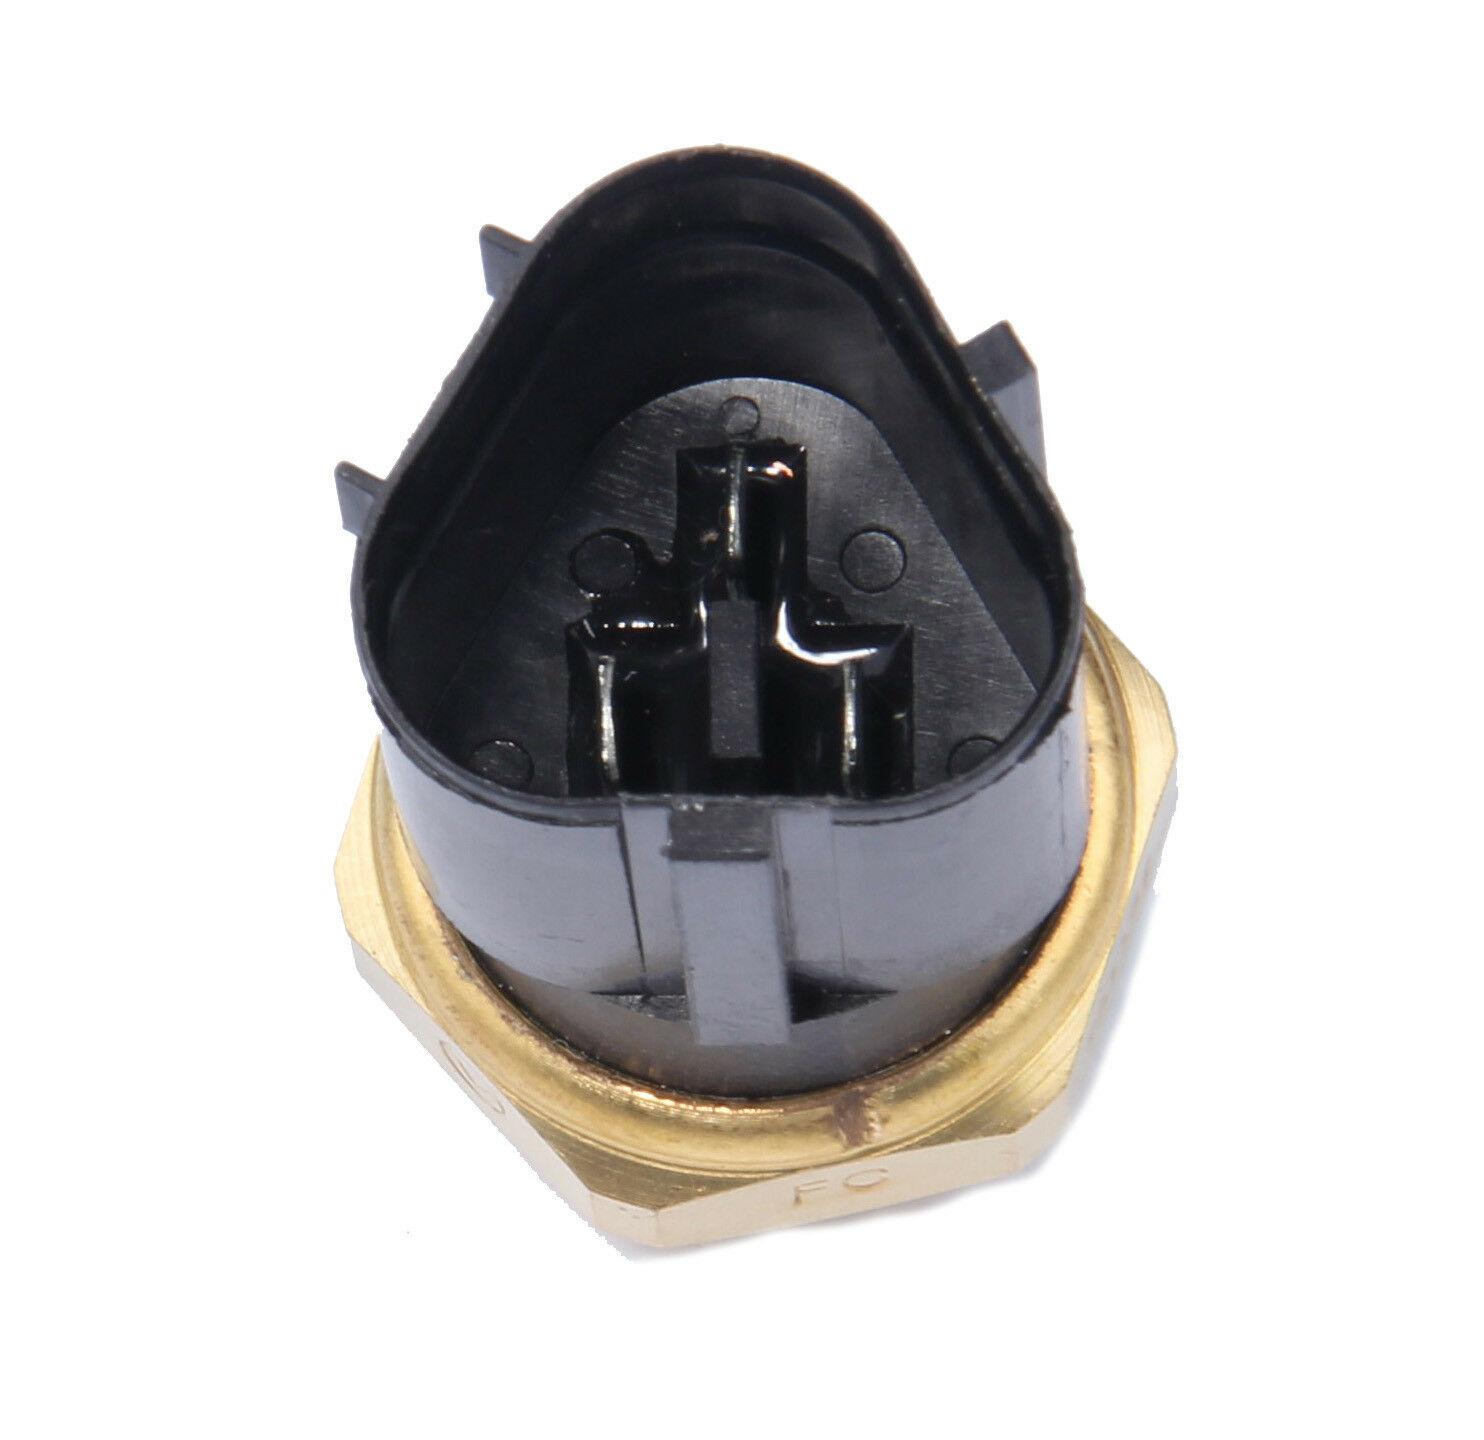 Tuto-remplacement-thermocontact-de-refroidissement-A3-8L-3.jpg